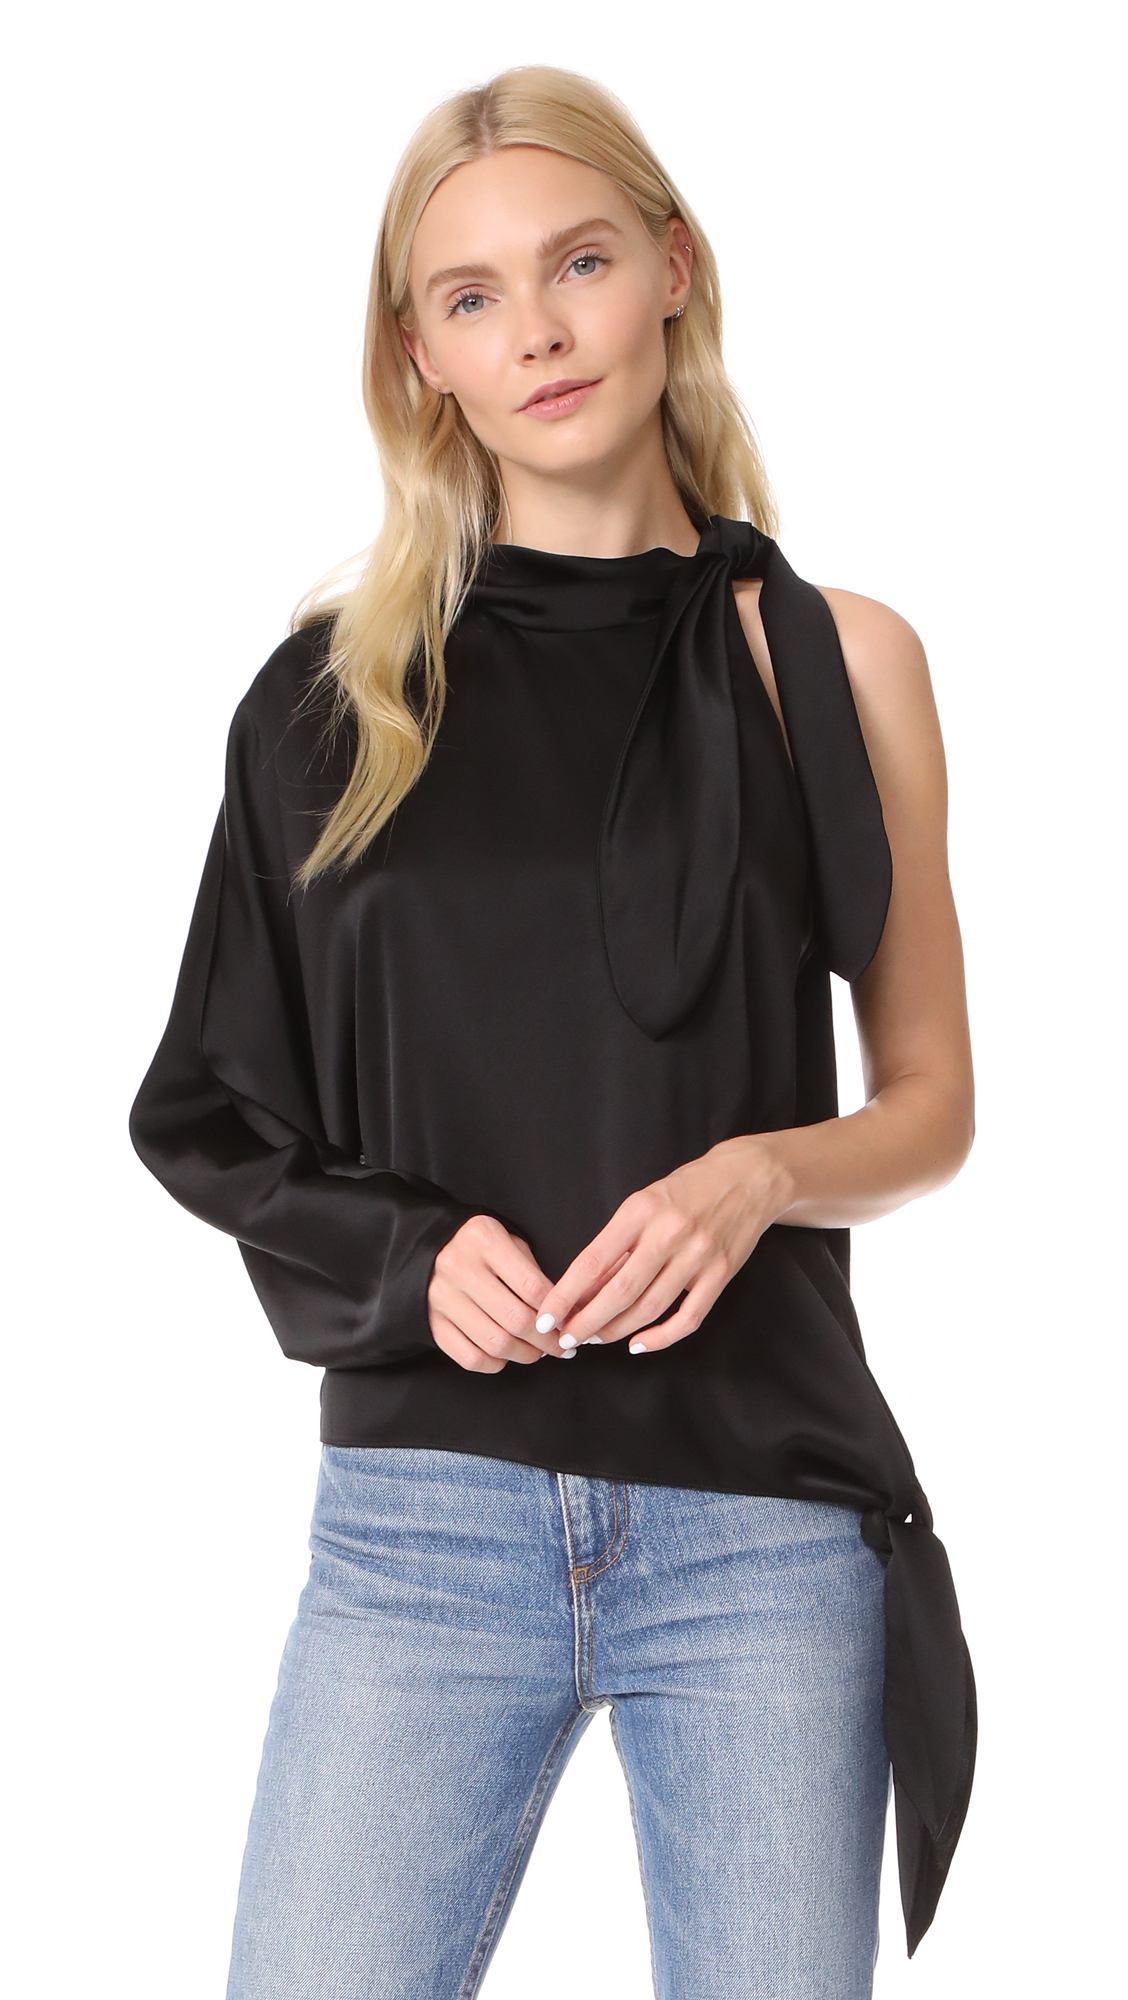 Diane von Furstenberg One Shoulder Knotted Blouse - Black